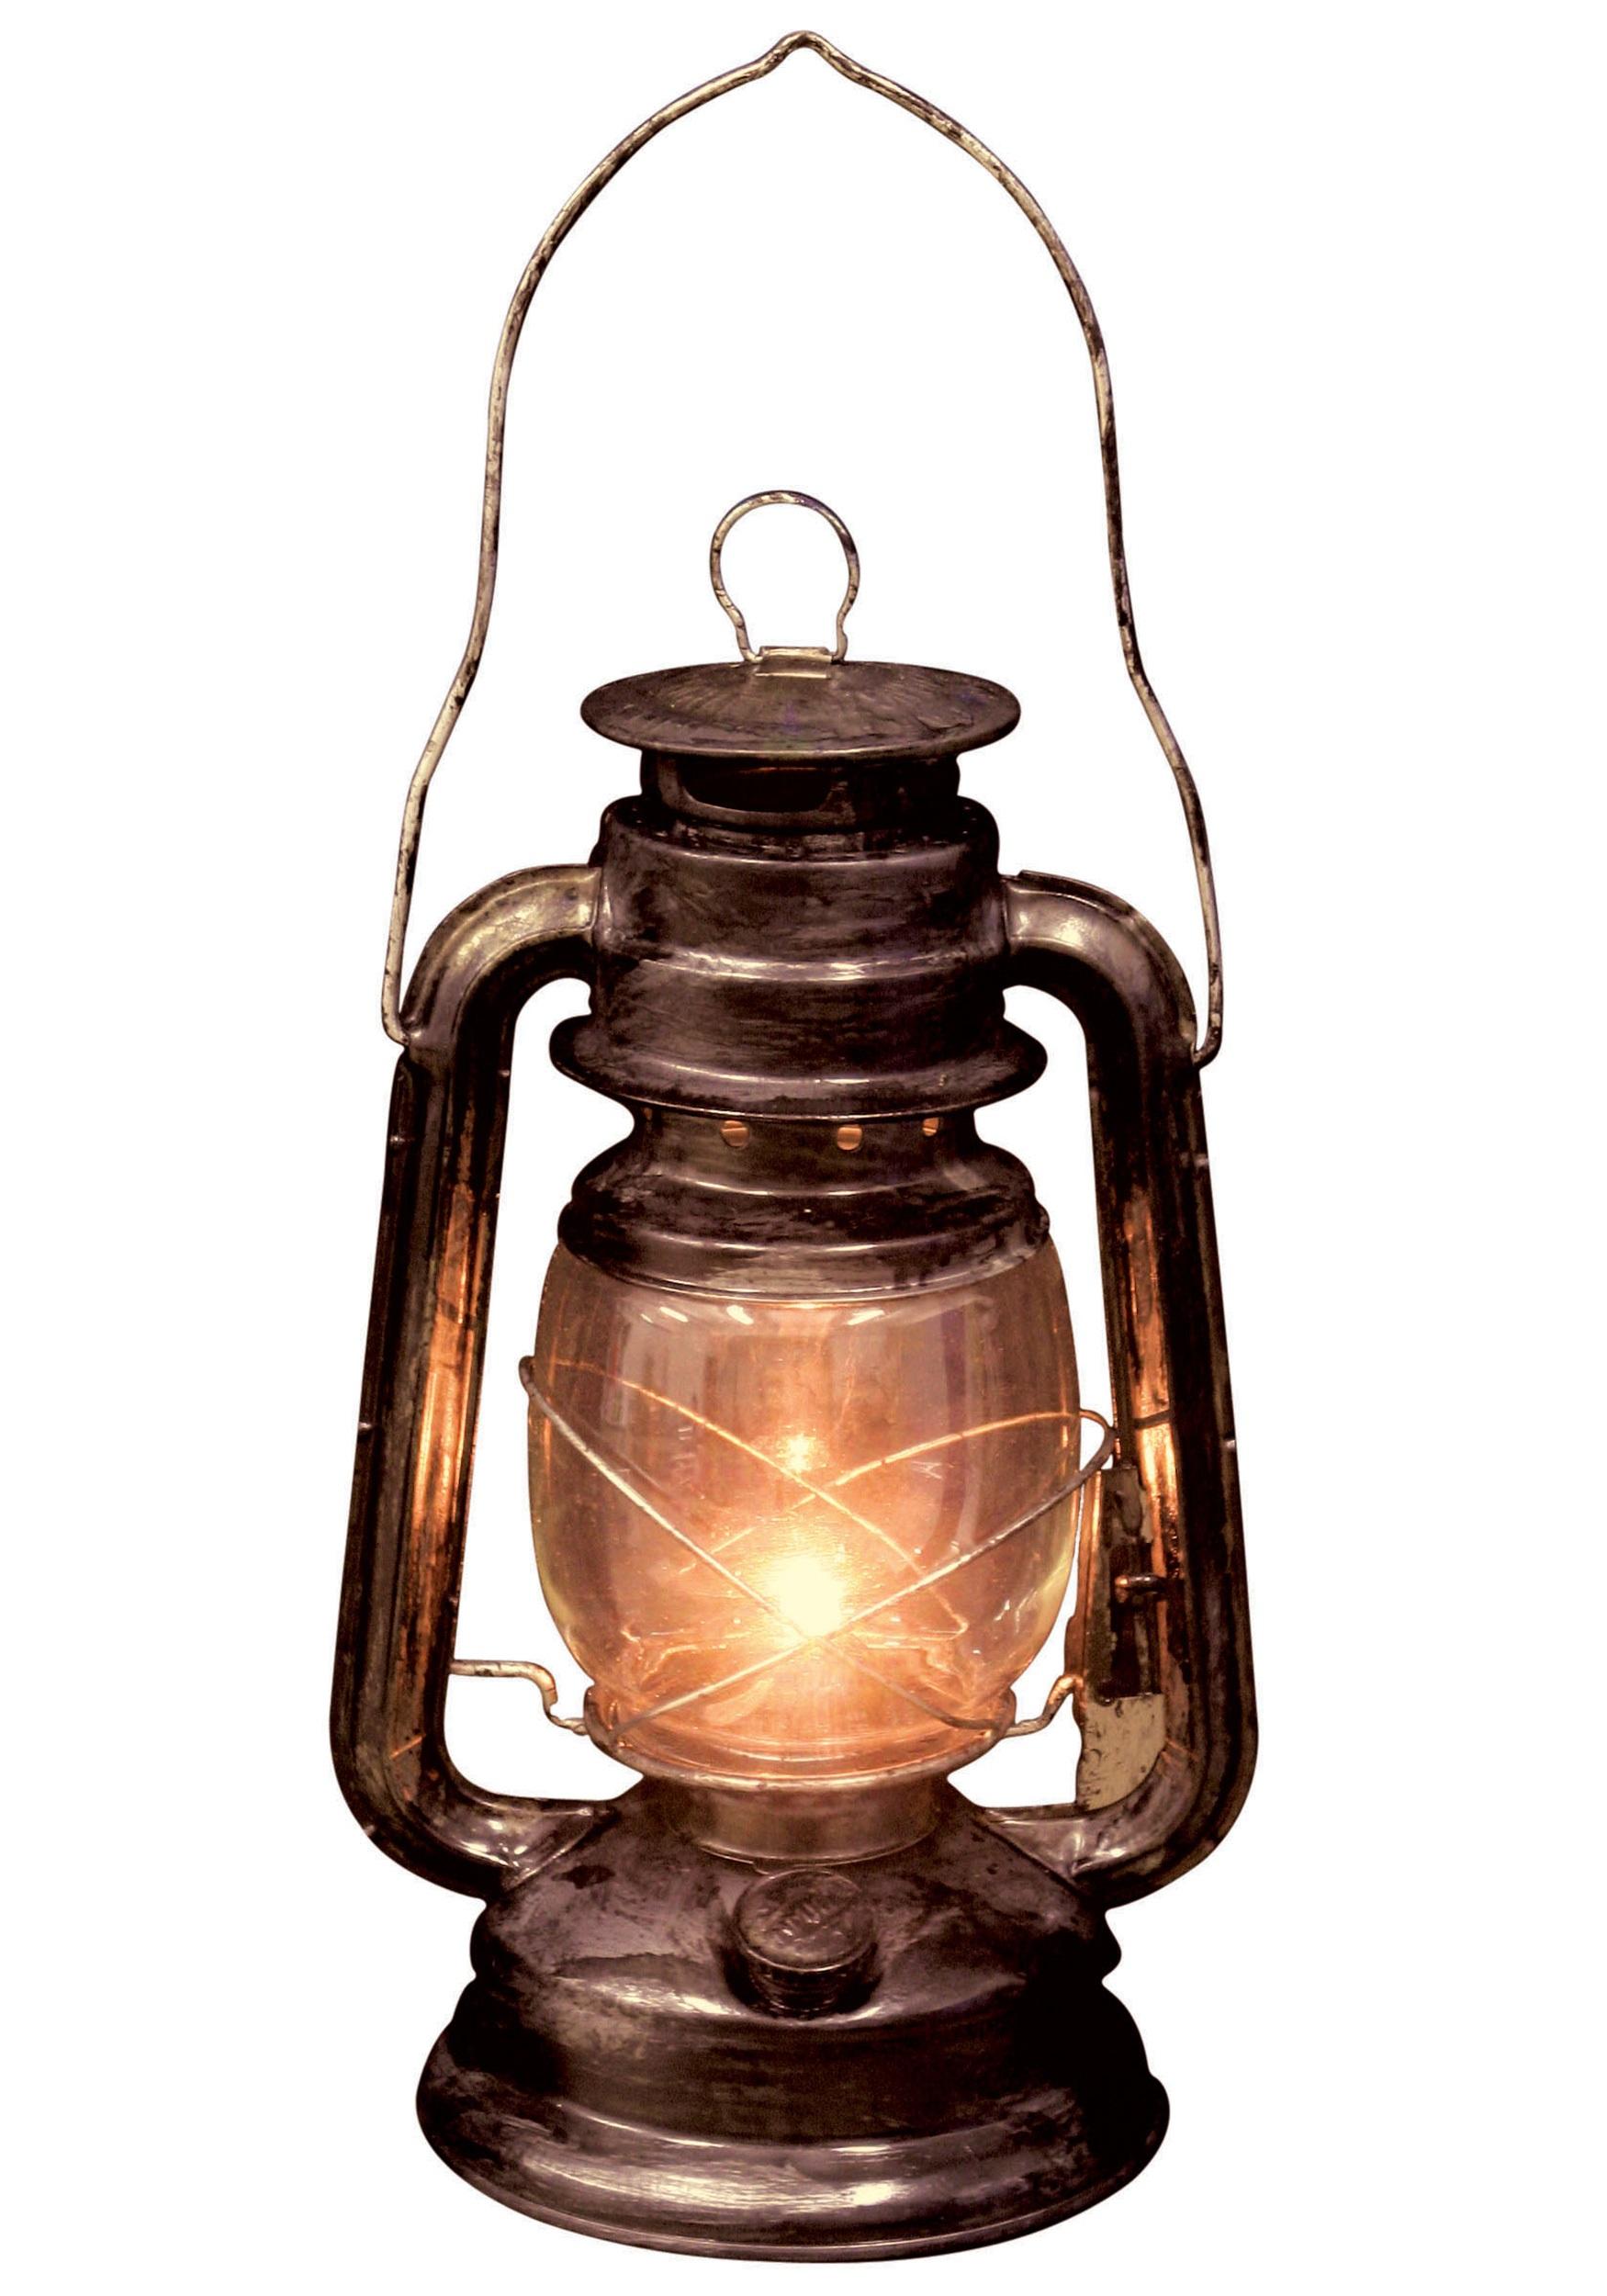 گانچھے:  بجلی کا بحران شدت اختیار کر گیا